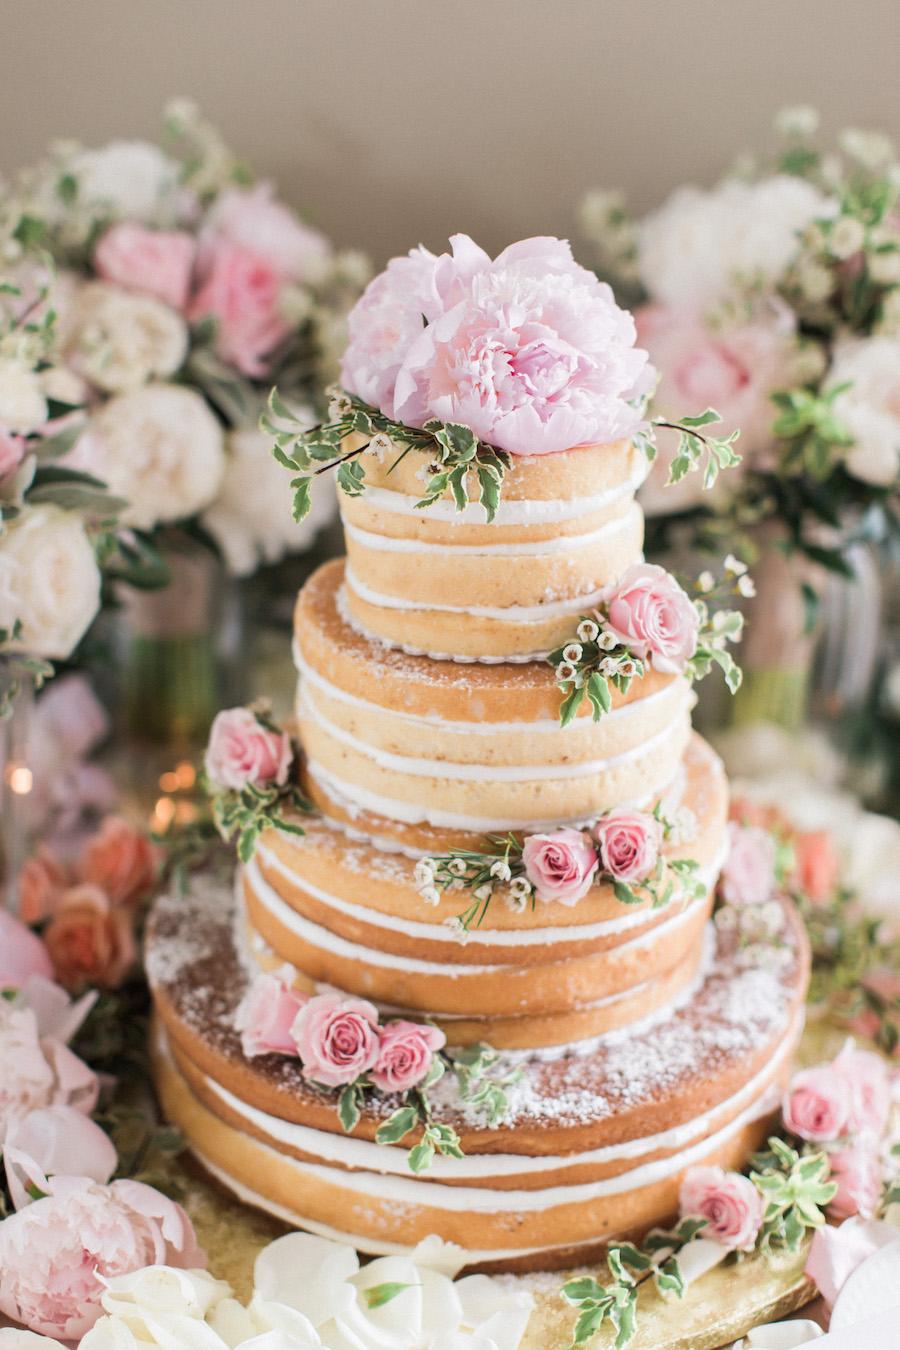 Naked Cake With Pink Flowers Elizabeth Anne Designs The Wedding Blog